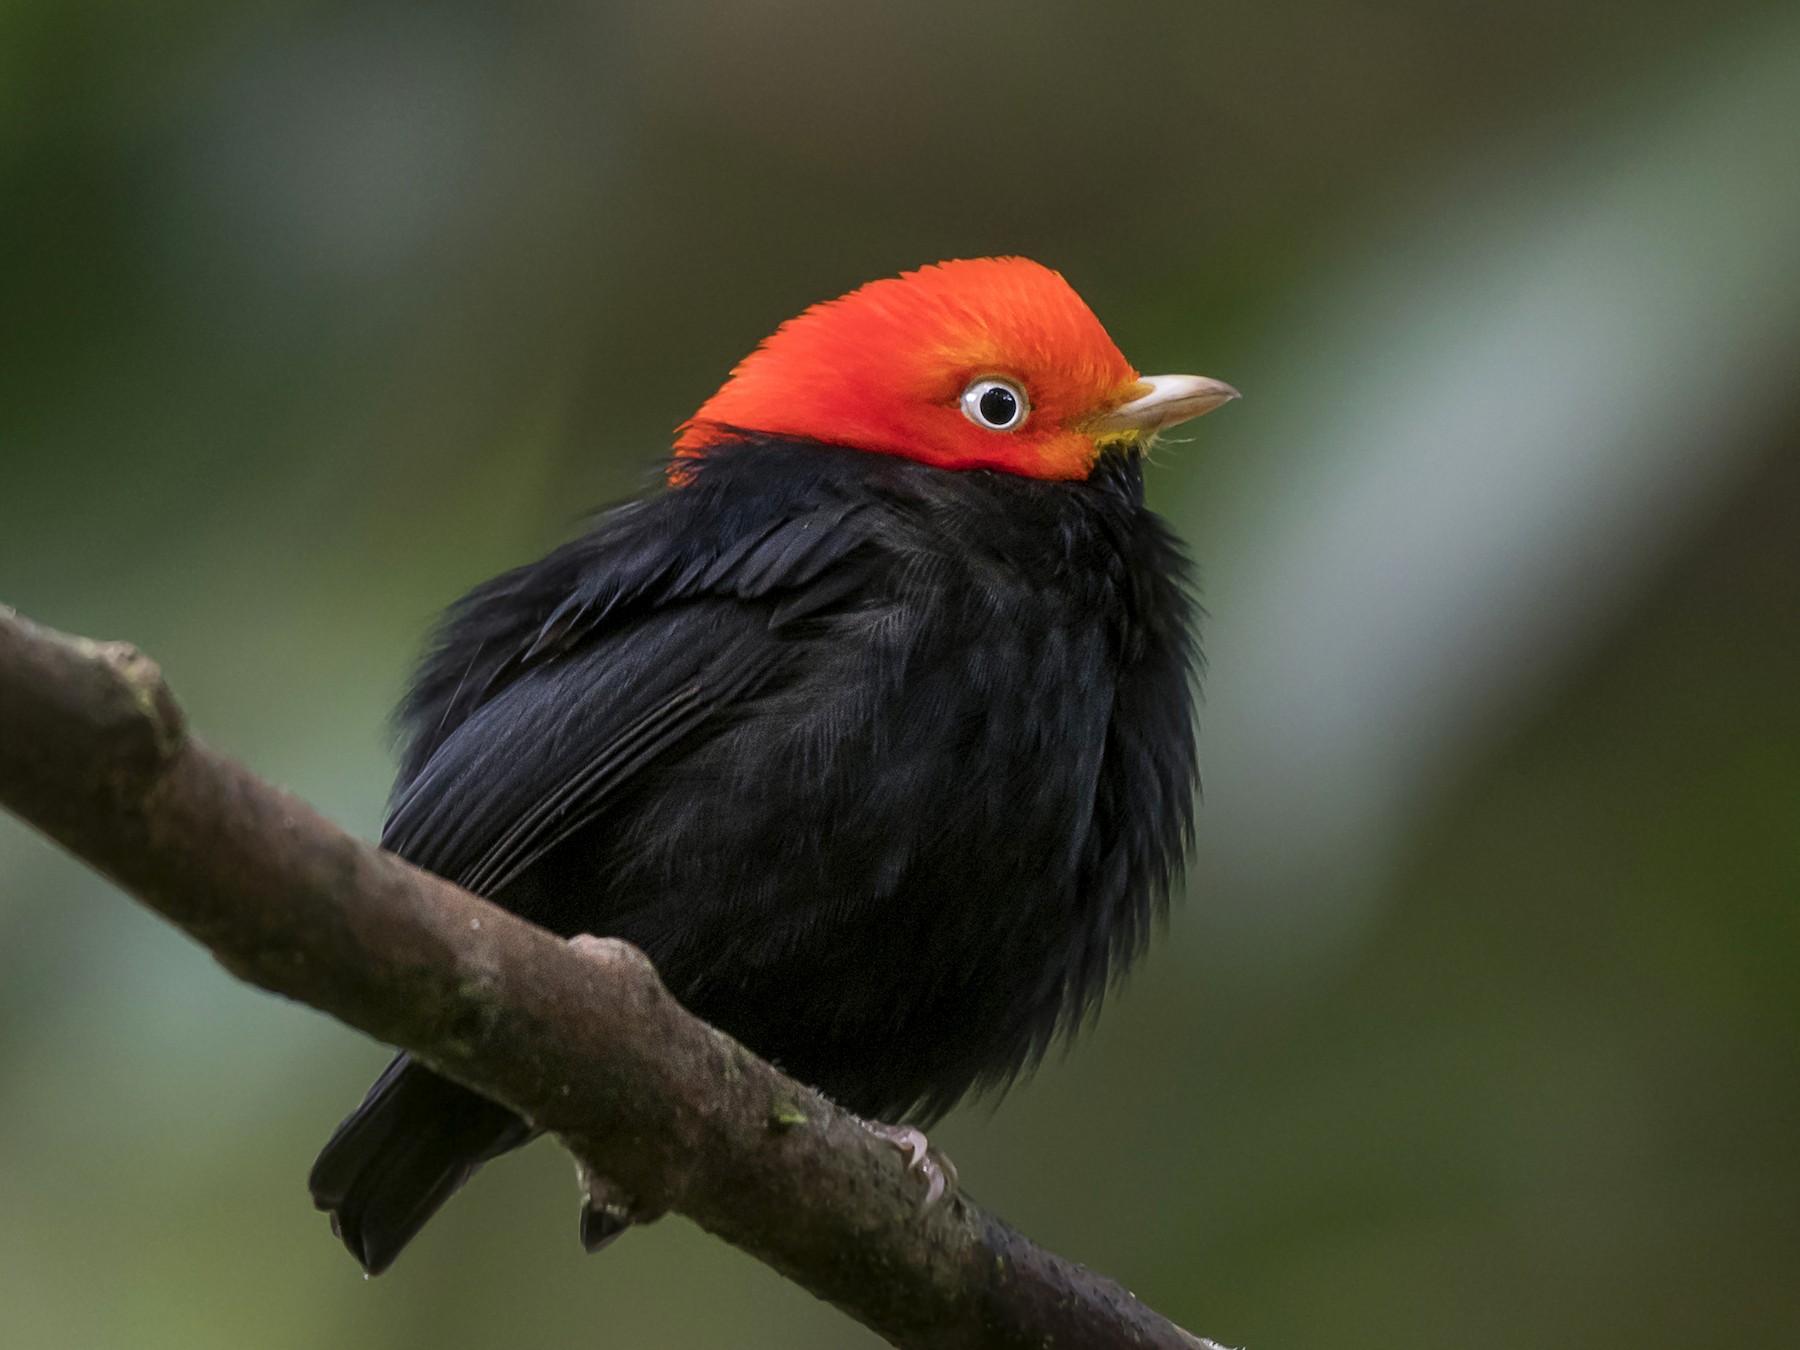 Red-capped Manakin - fernando Burgalin Sequeria